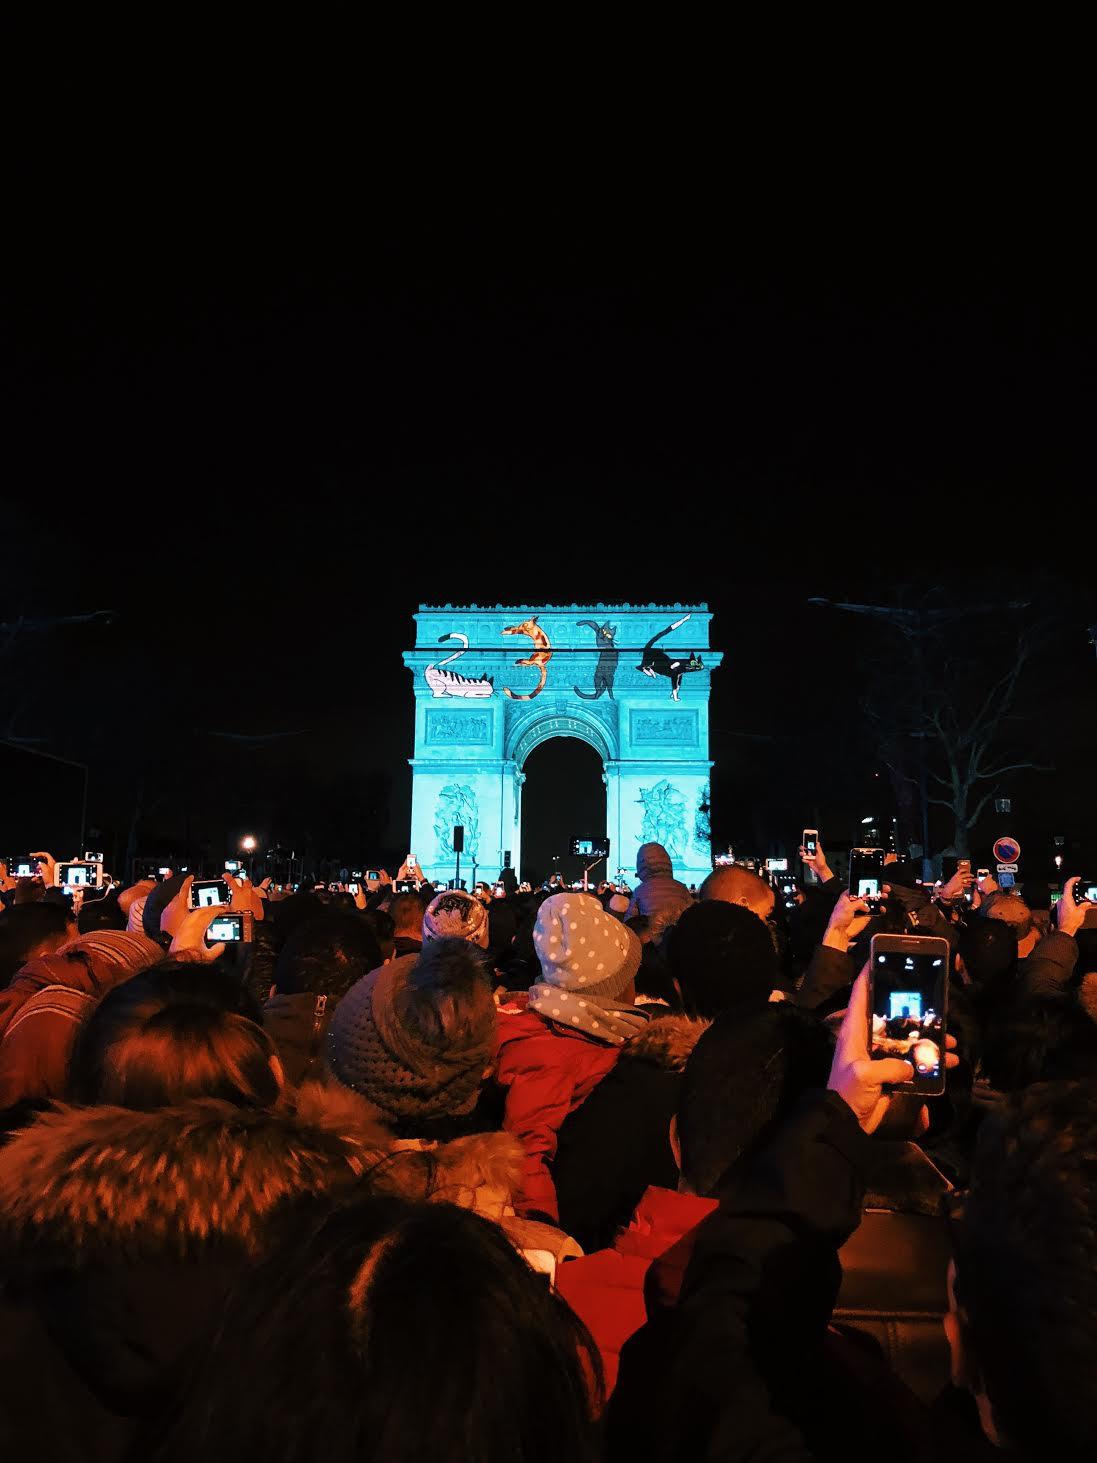 Muslim-travel-tips-New-Years-Eve-Arc-de-Triomphe-light-show.jpg